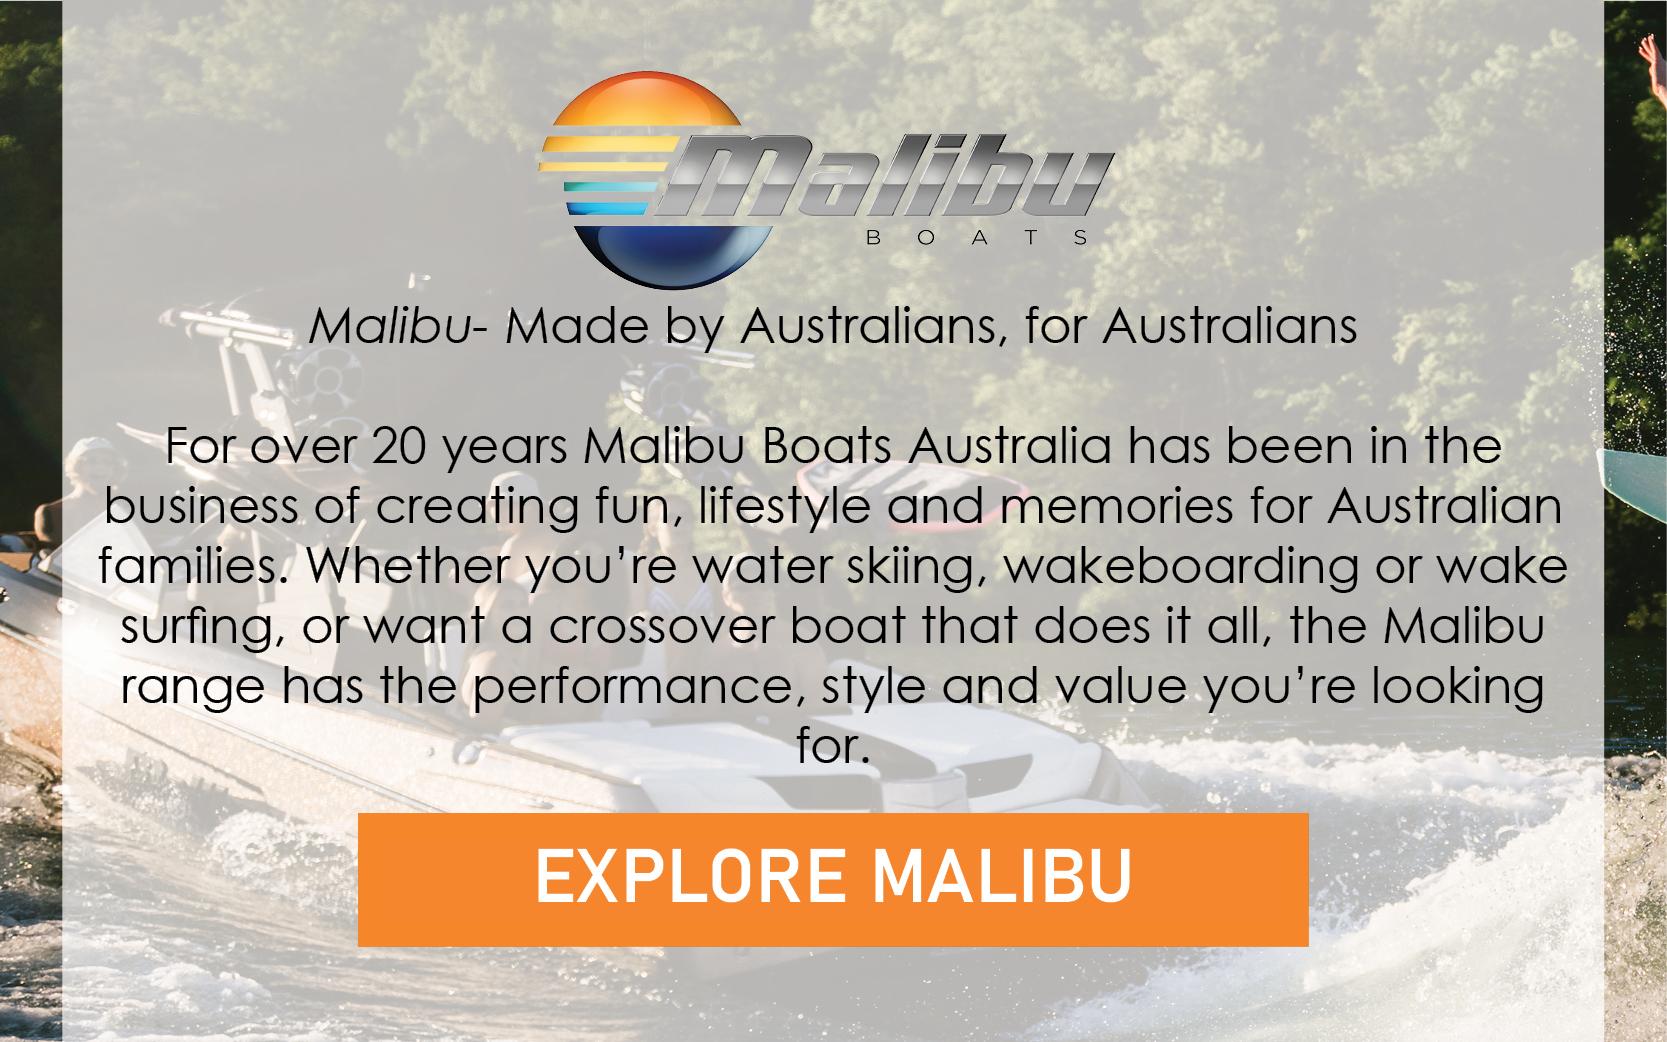 Malibu - Made by Australians, for Australians.